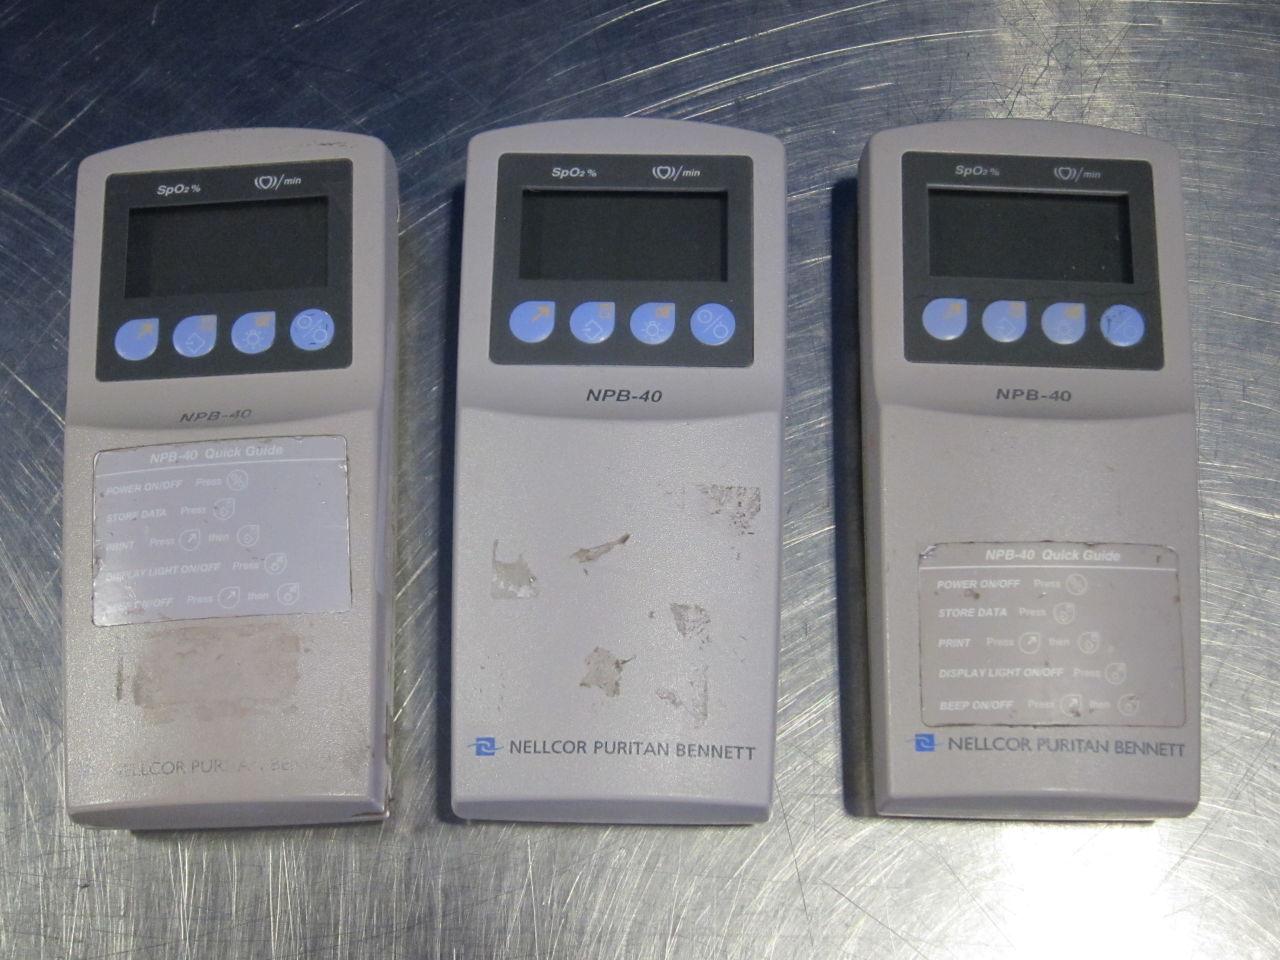 NELLCOR PURITAN BENNETT NPB-40  - Lot of 3 Oximeter - Pulse